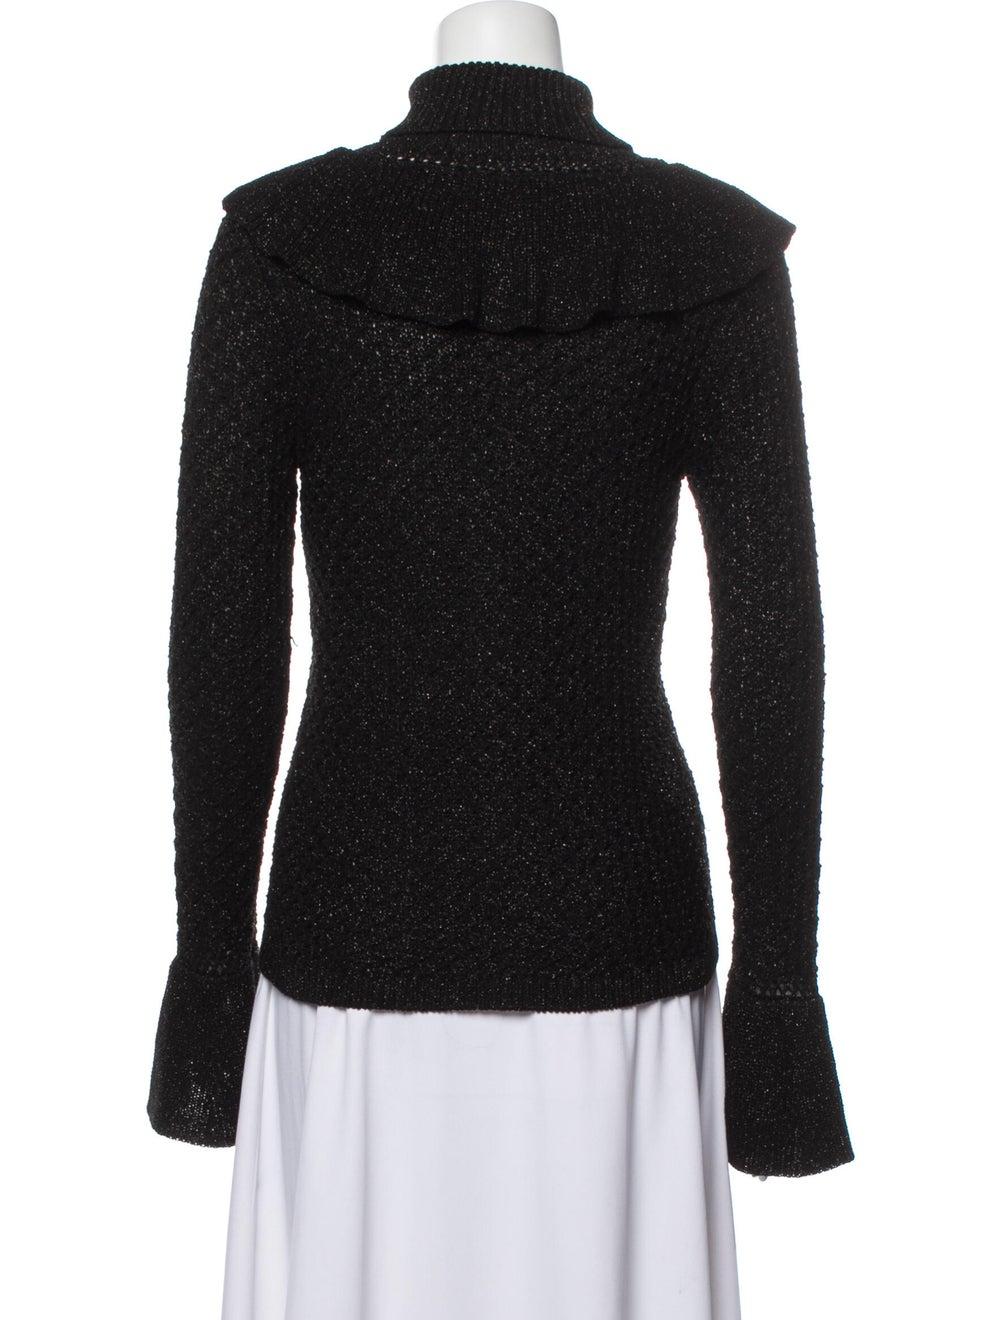 Co. Turtleneck Sweater Black - image 3